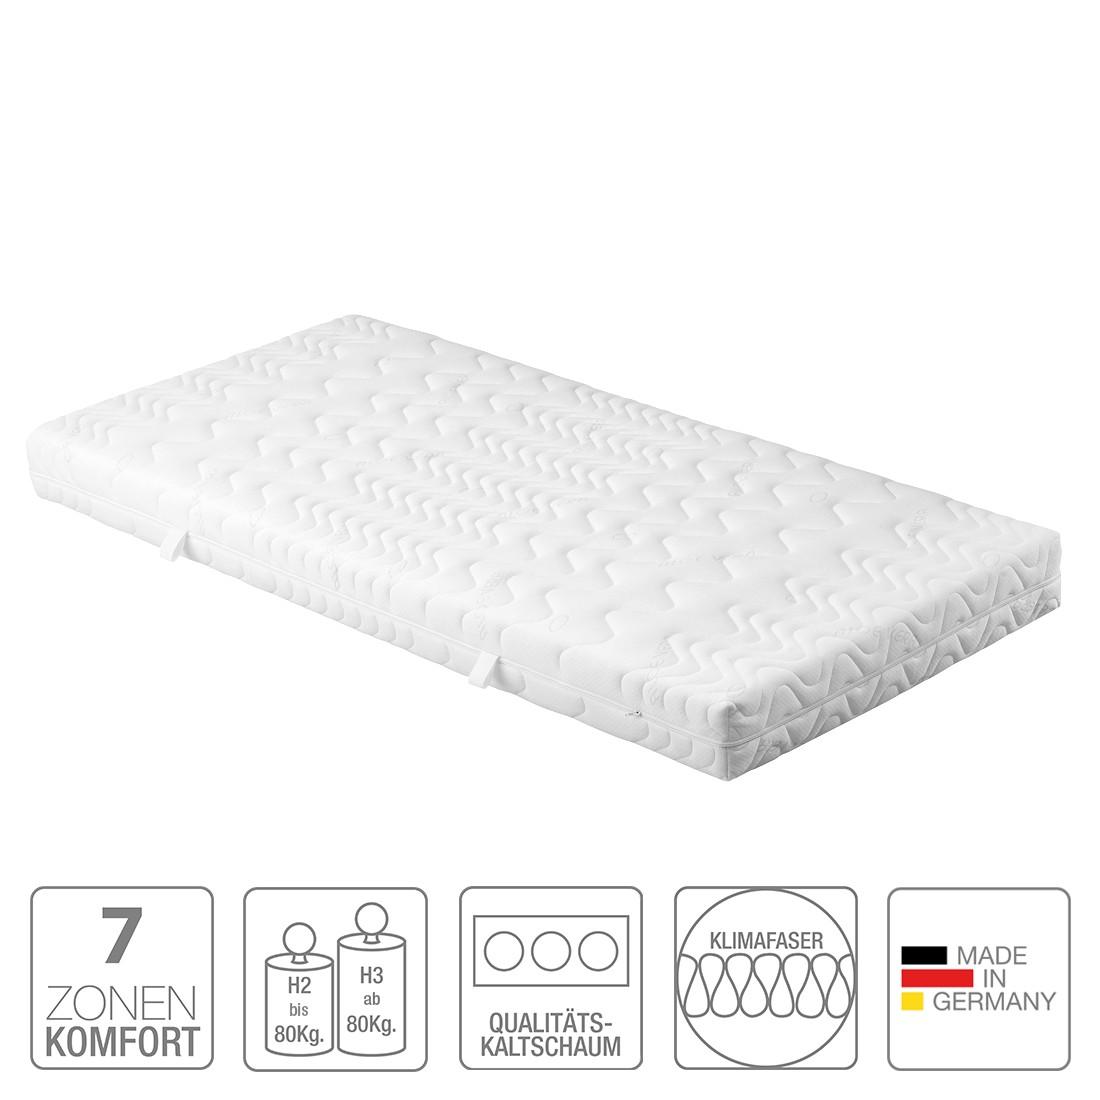 7 zonen kaltschaummatratze seven 90 x 200cm h2 bis 80 kg nova dream sleepline online bestellen. Black Bedroom Furniture Sets. Home Design Ideas